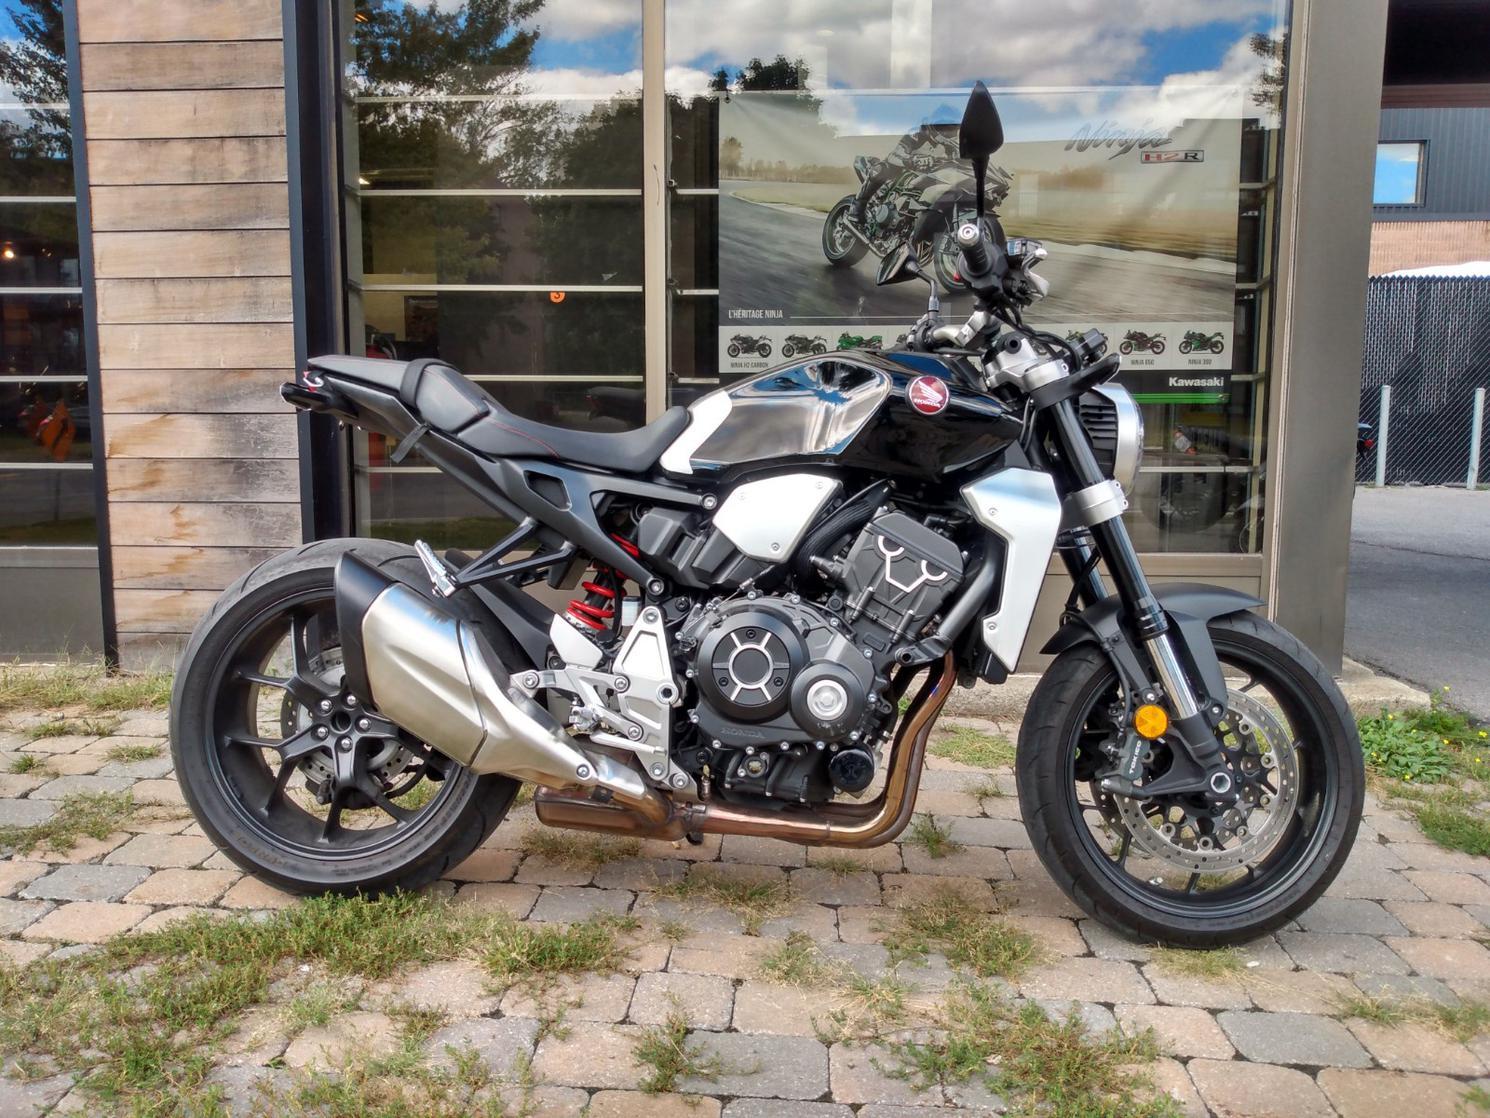 Honda CB1000 2018 - CB1000RA, ABS